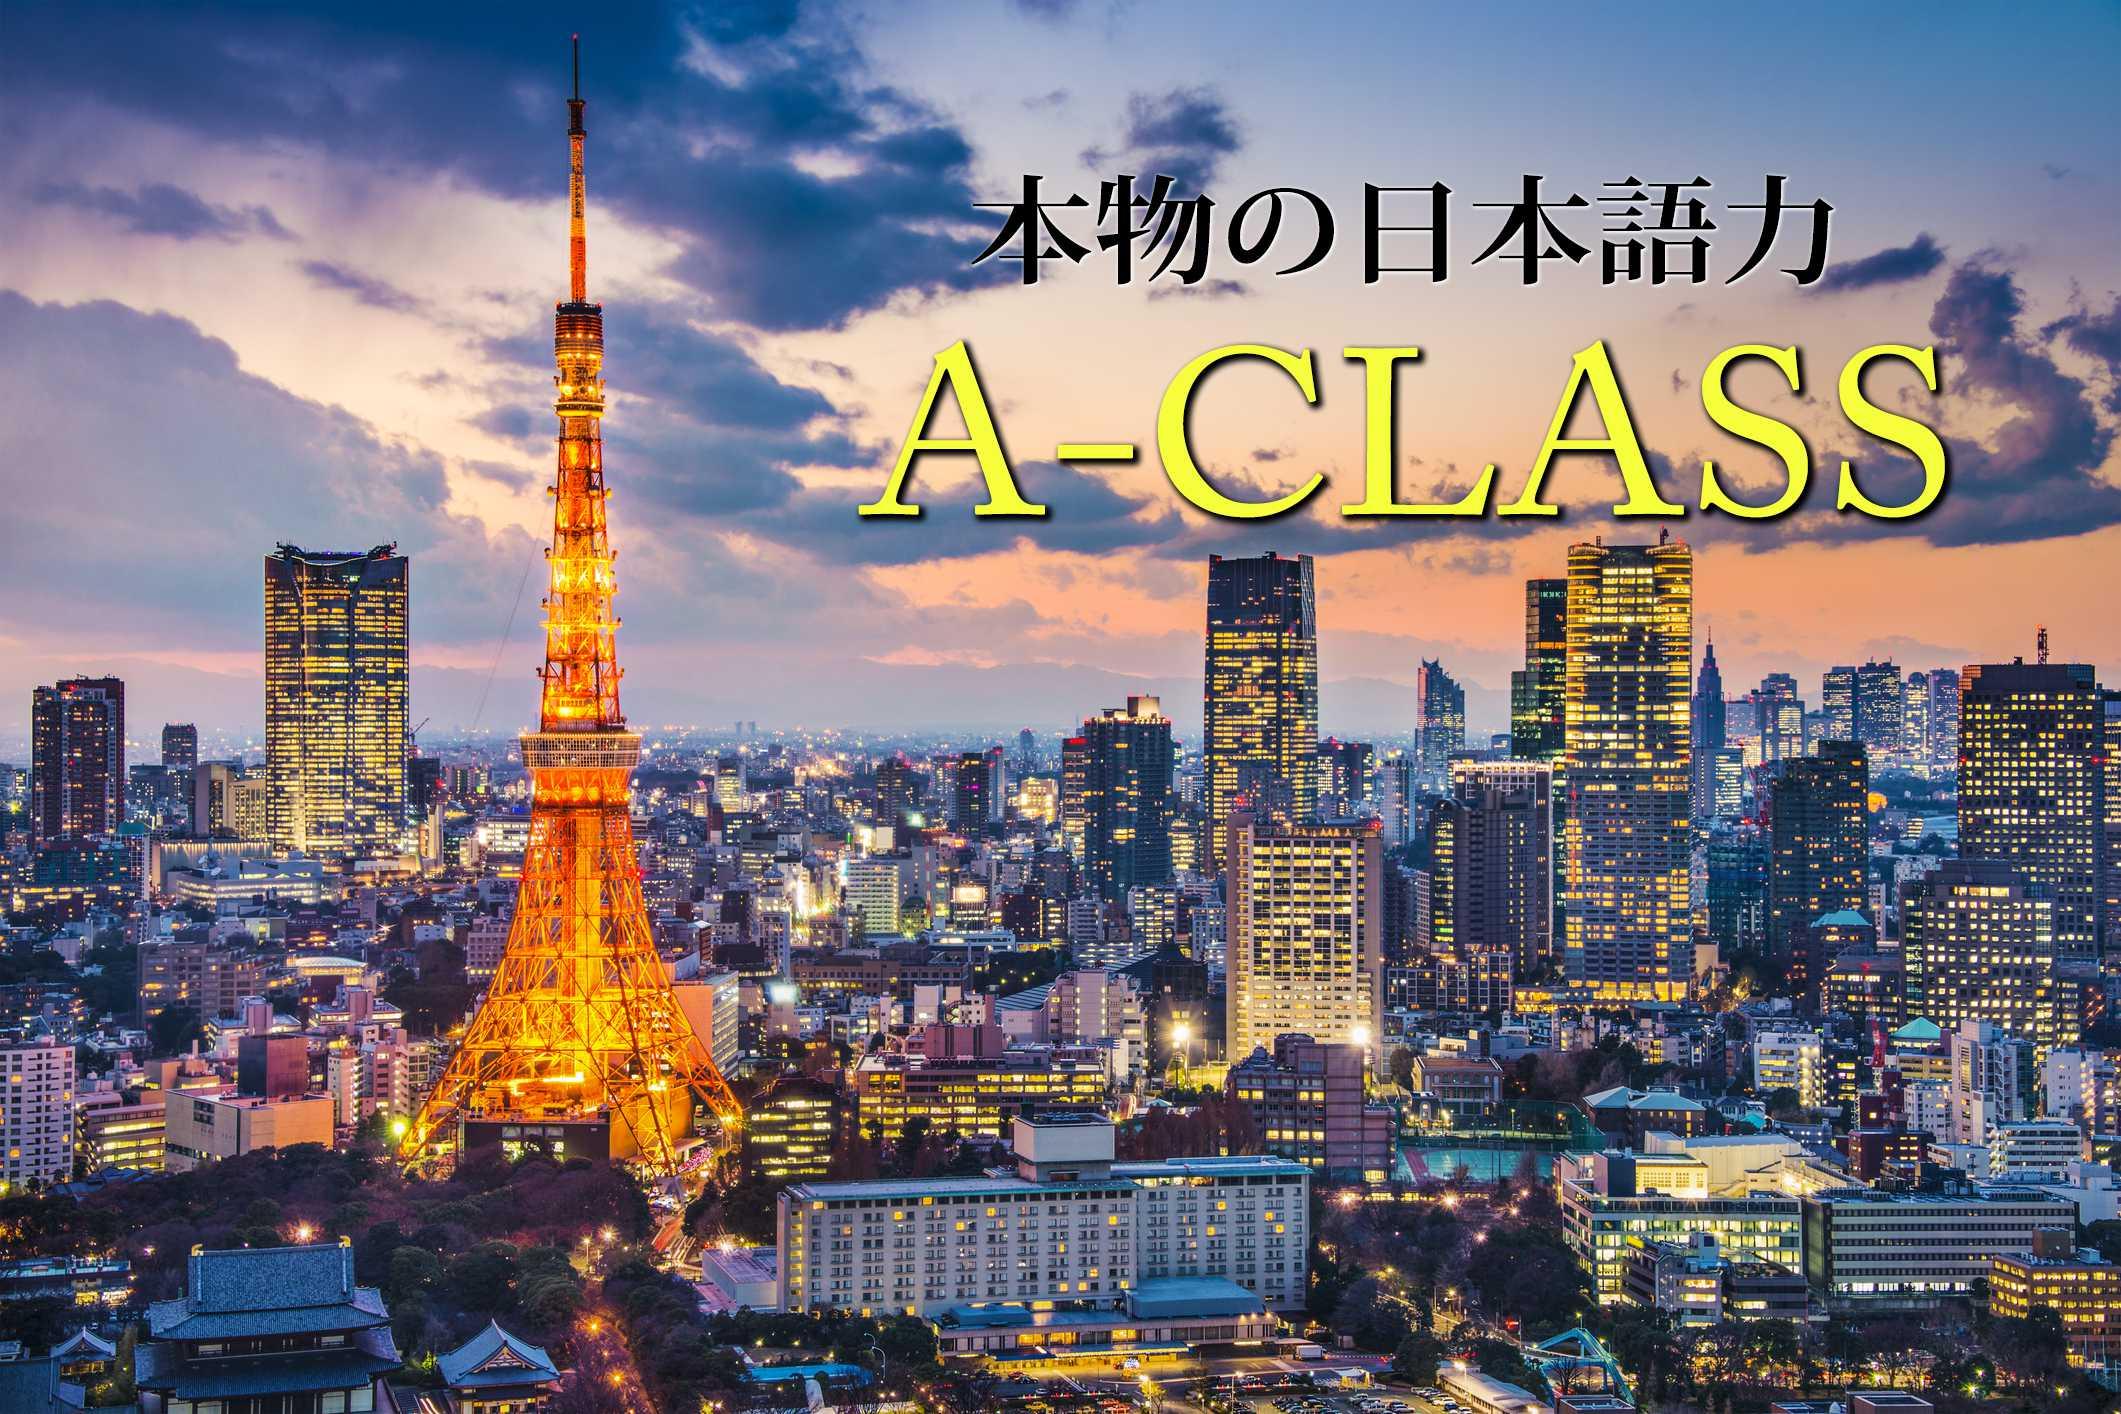 A-CLASS「超實踐高級日本語講座」2019年12月課程介紹/2019年12月授業スケジュール